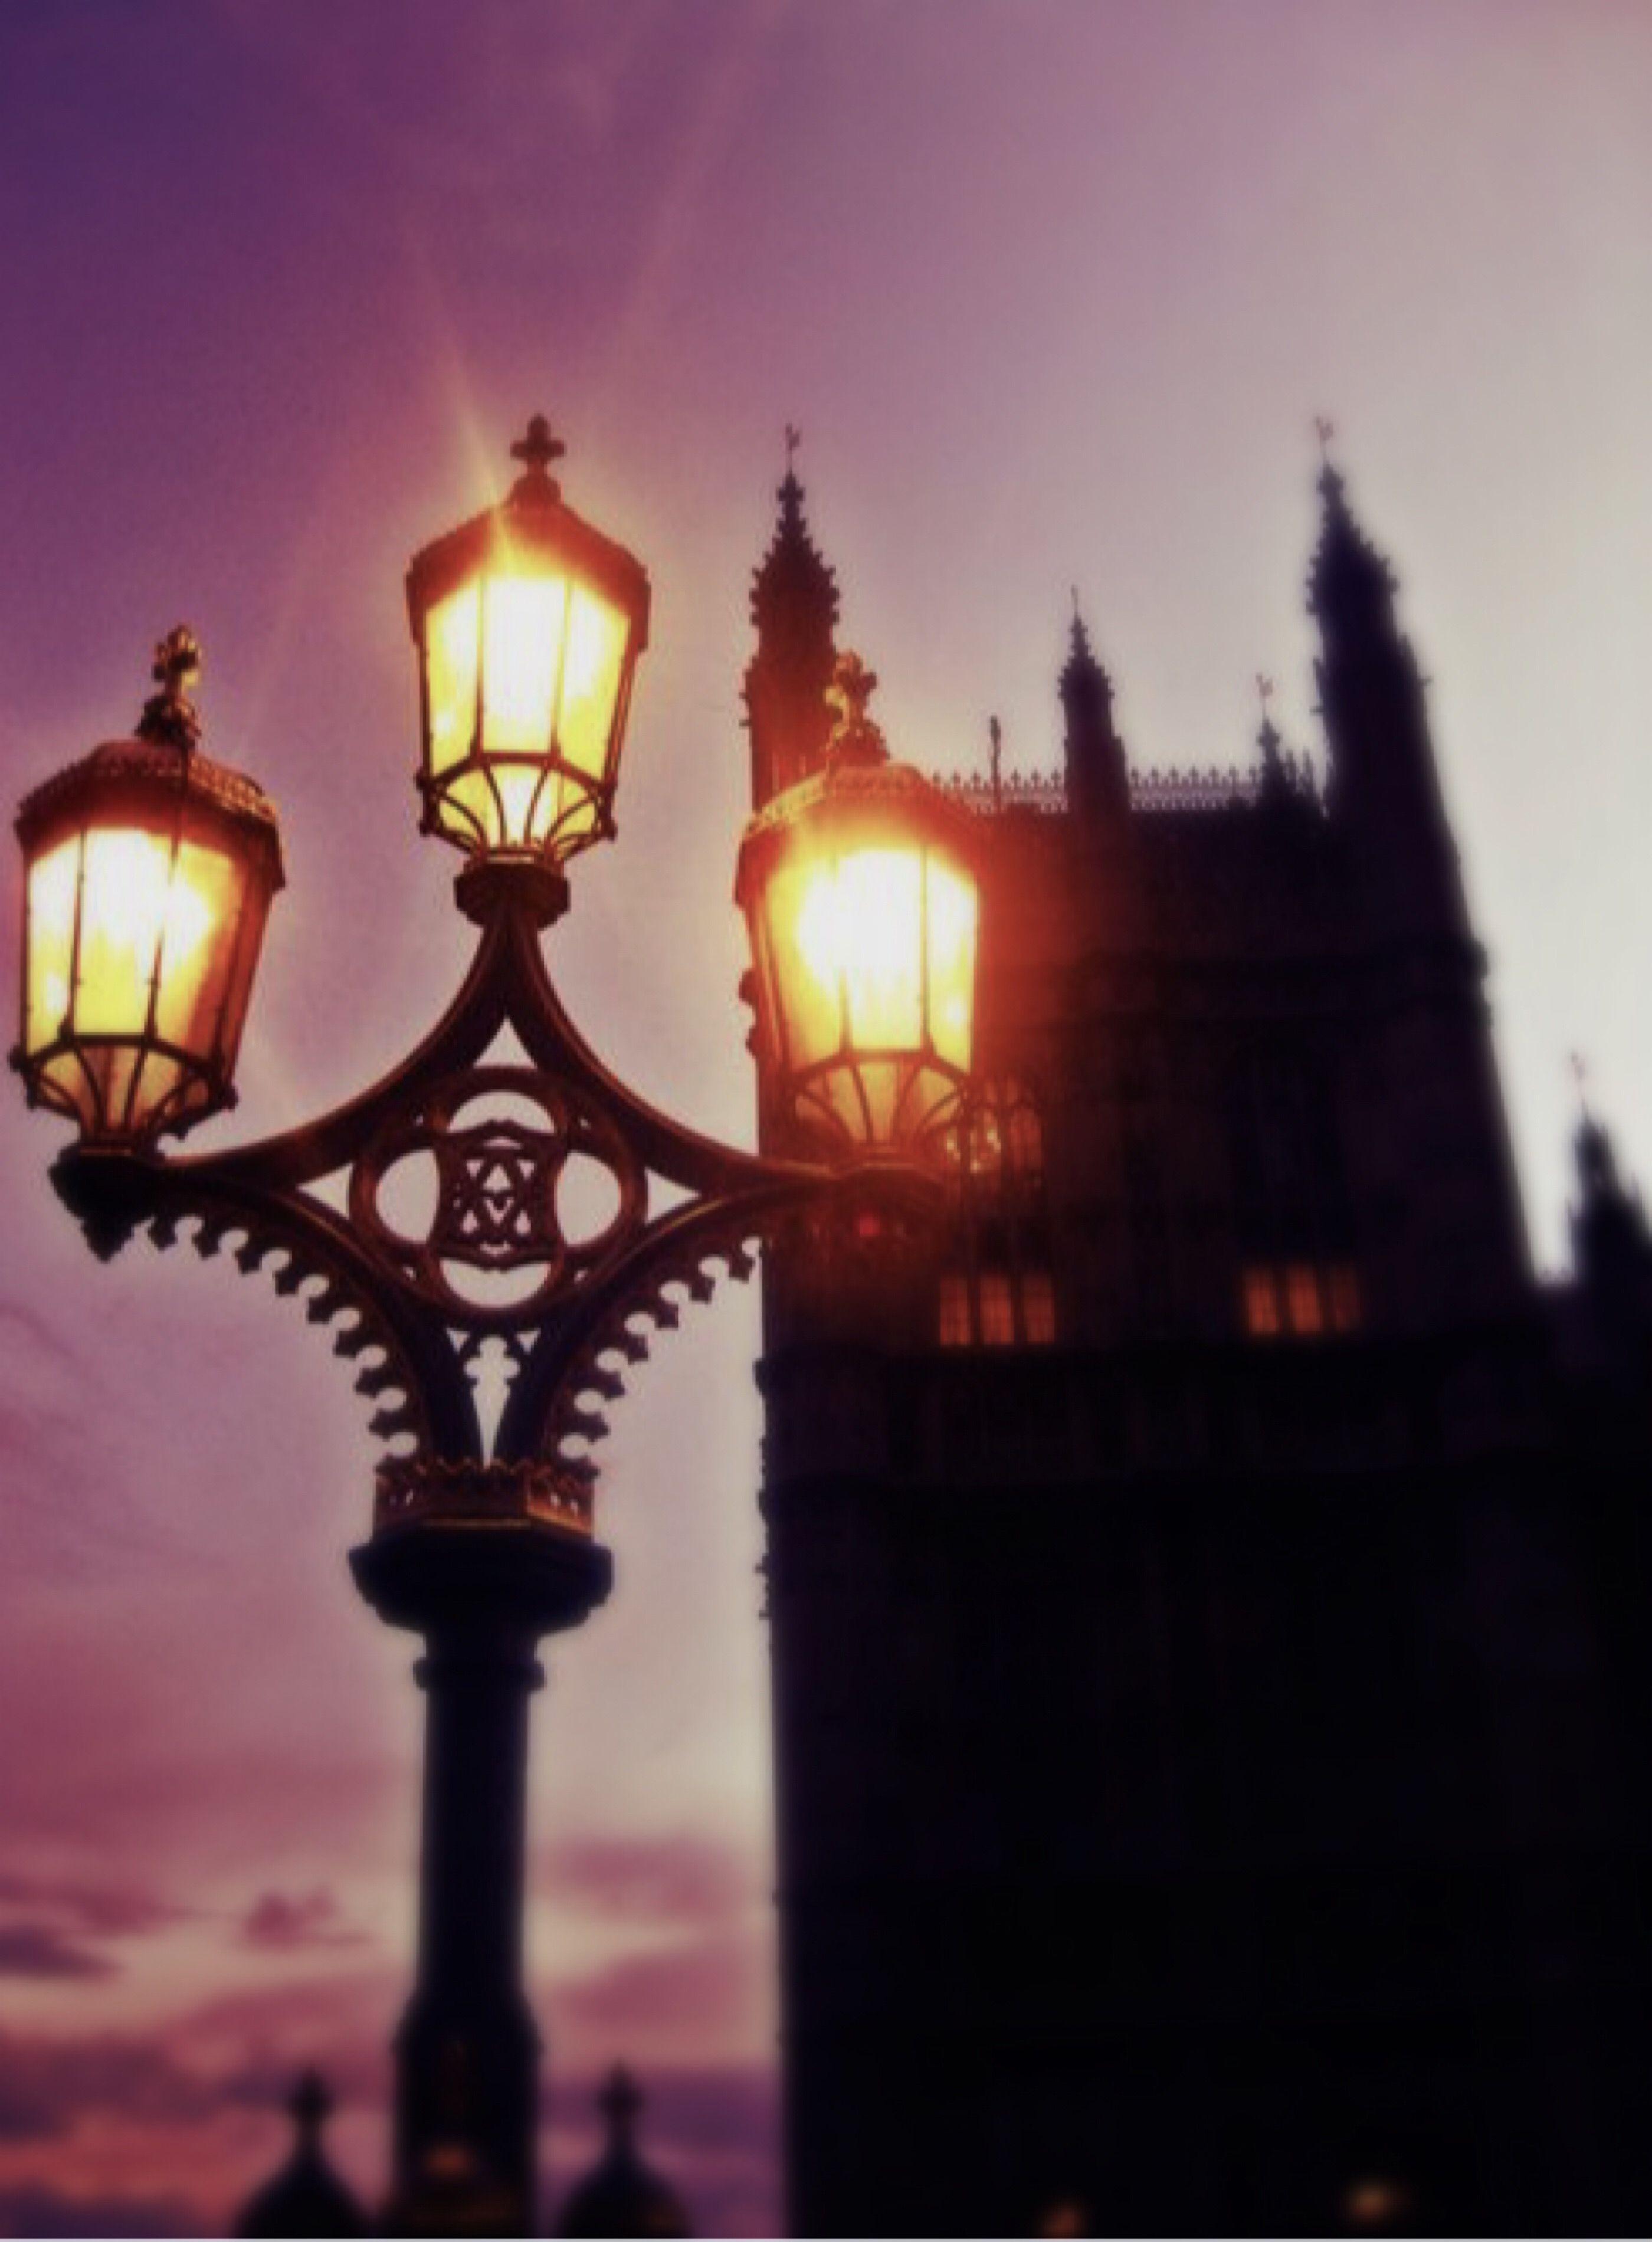 Pin By Jo Allen On Ye Olde Lanterns Lamp Posts Street Light Street Lamp Post Lights